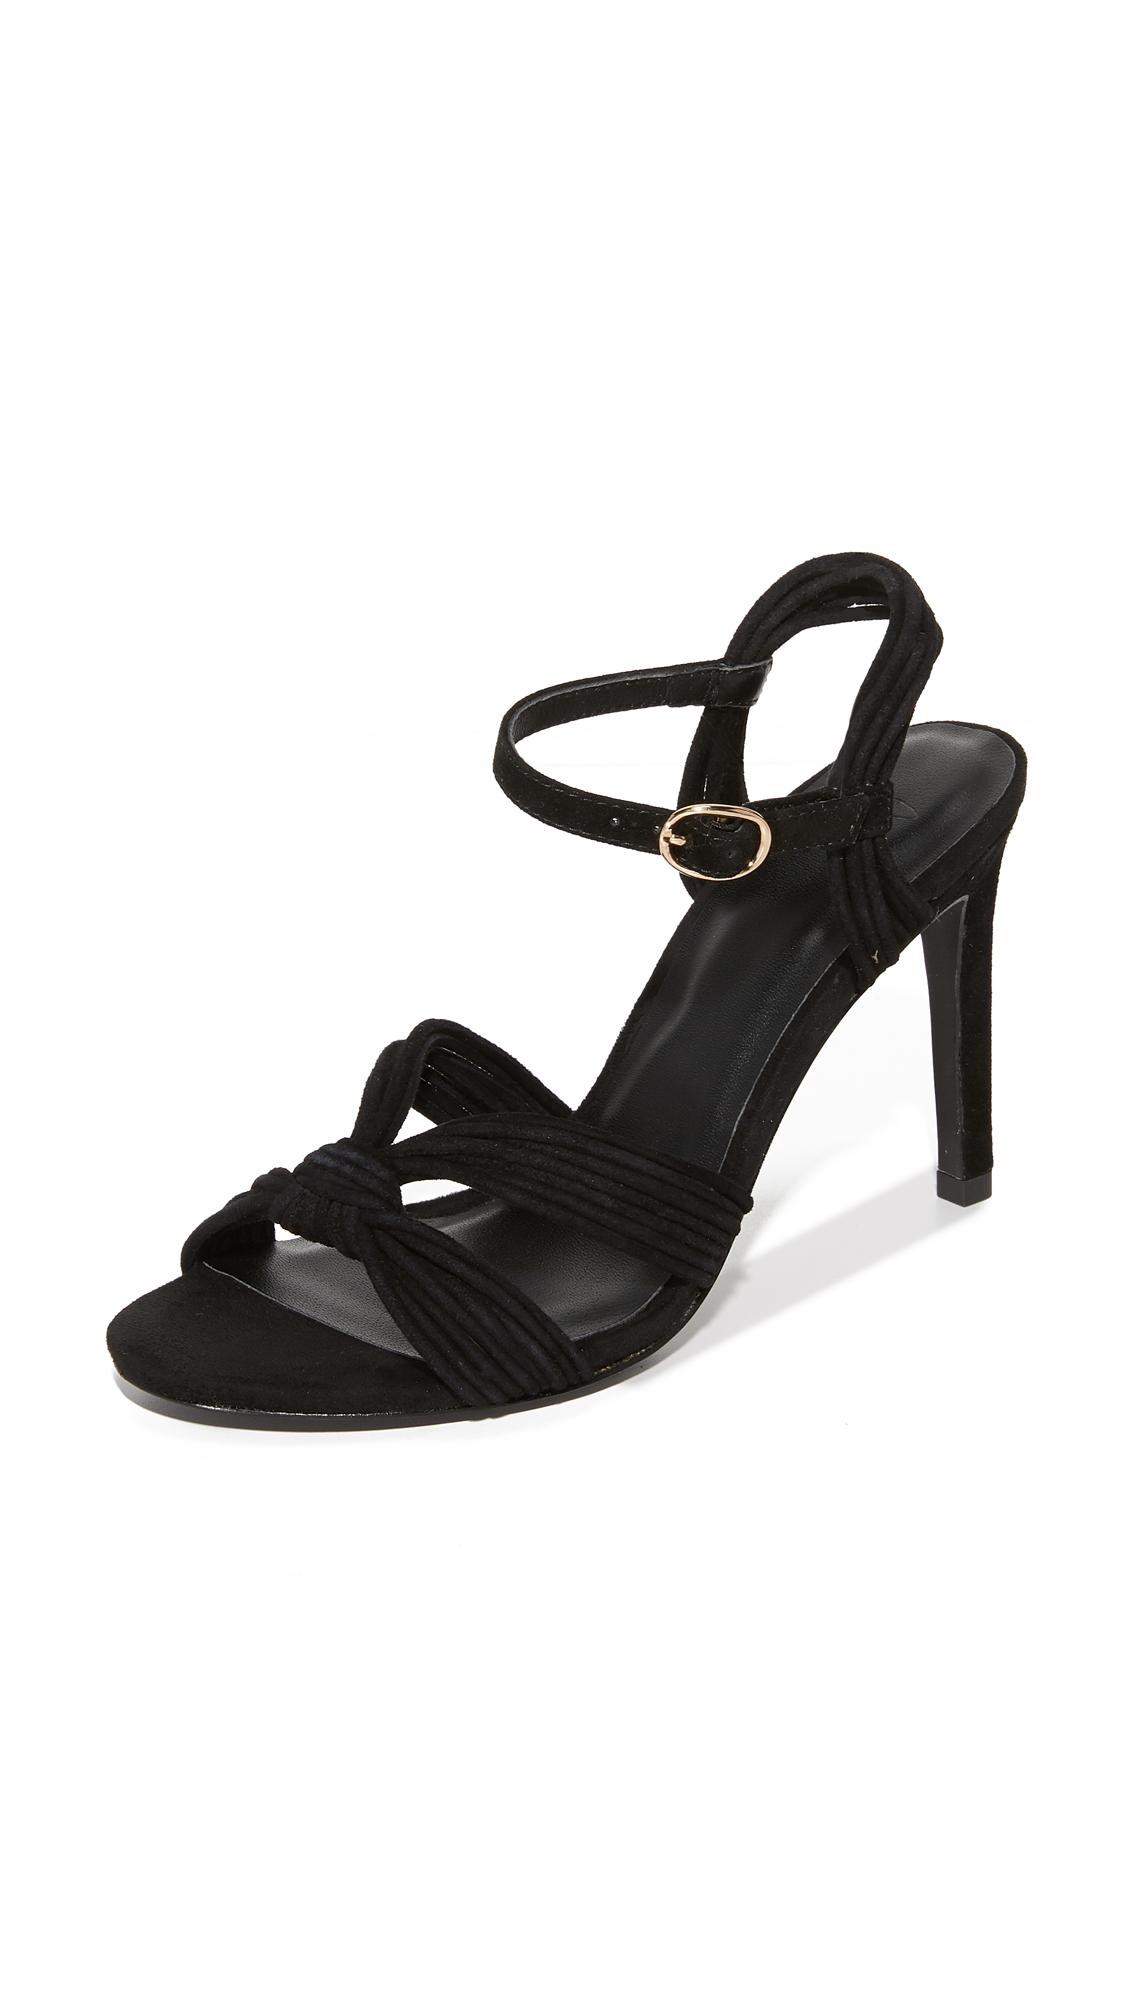 Joie Airlia Sandals - Black